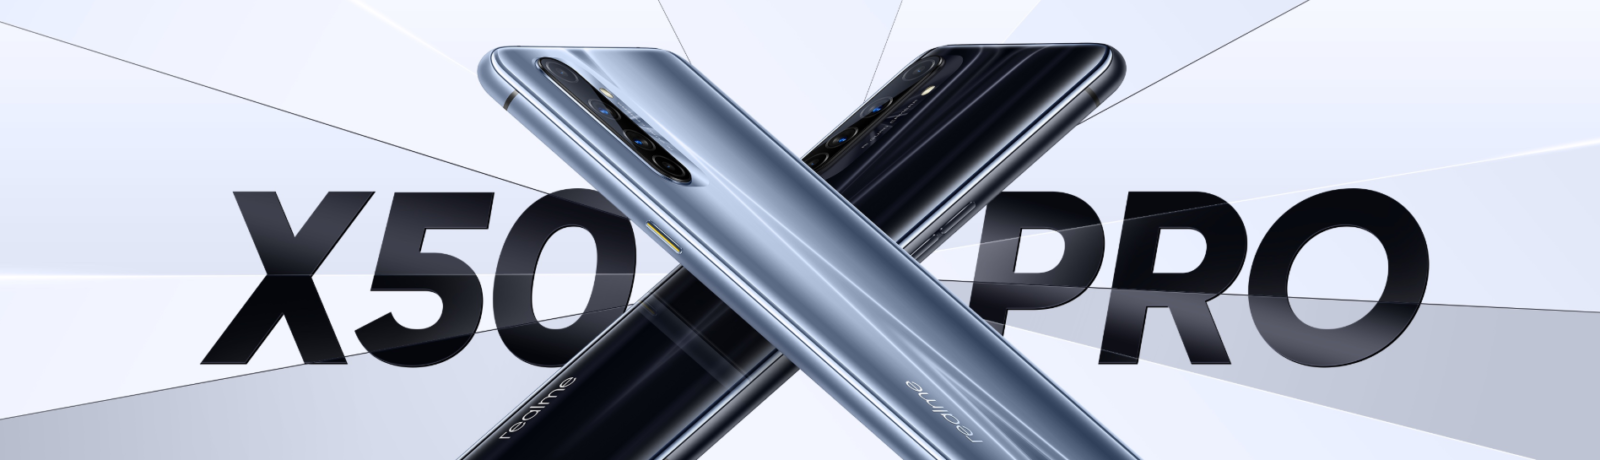 realme-x50-pro-player-edition-presentacion